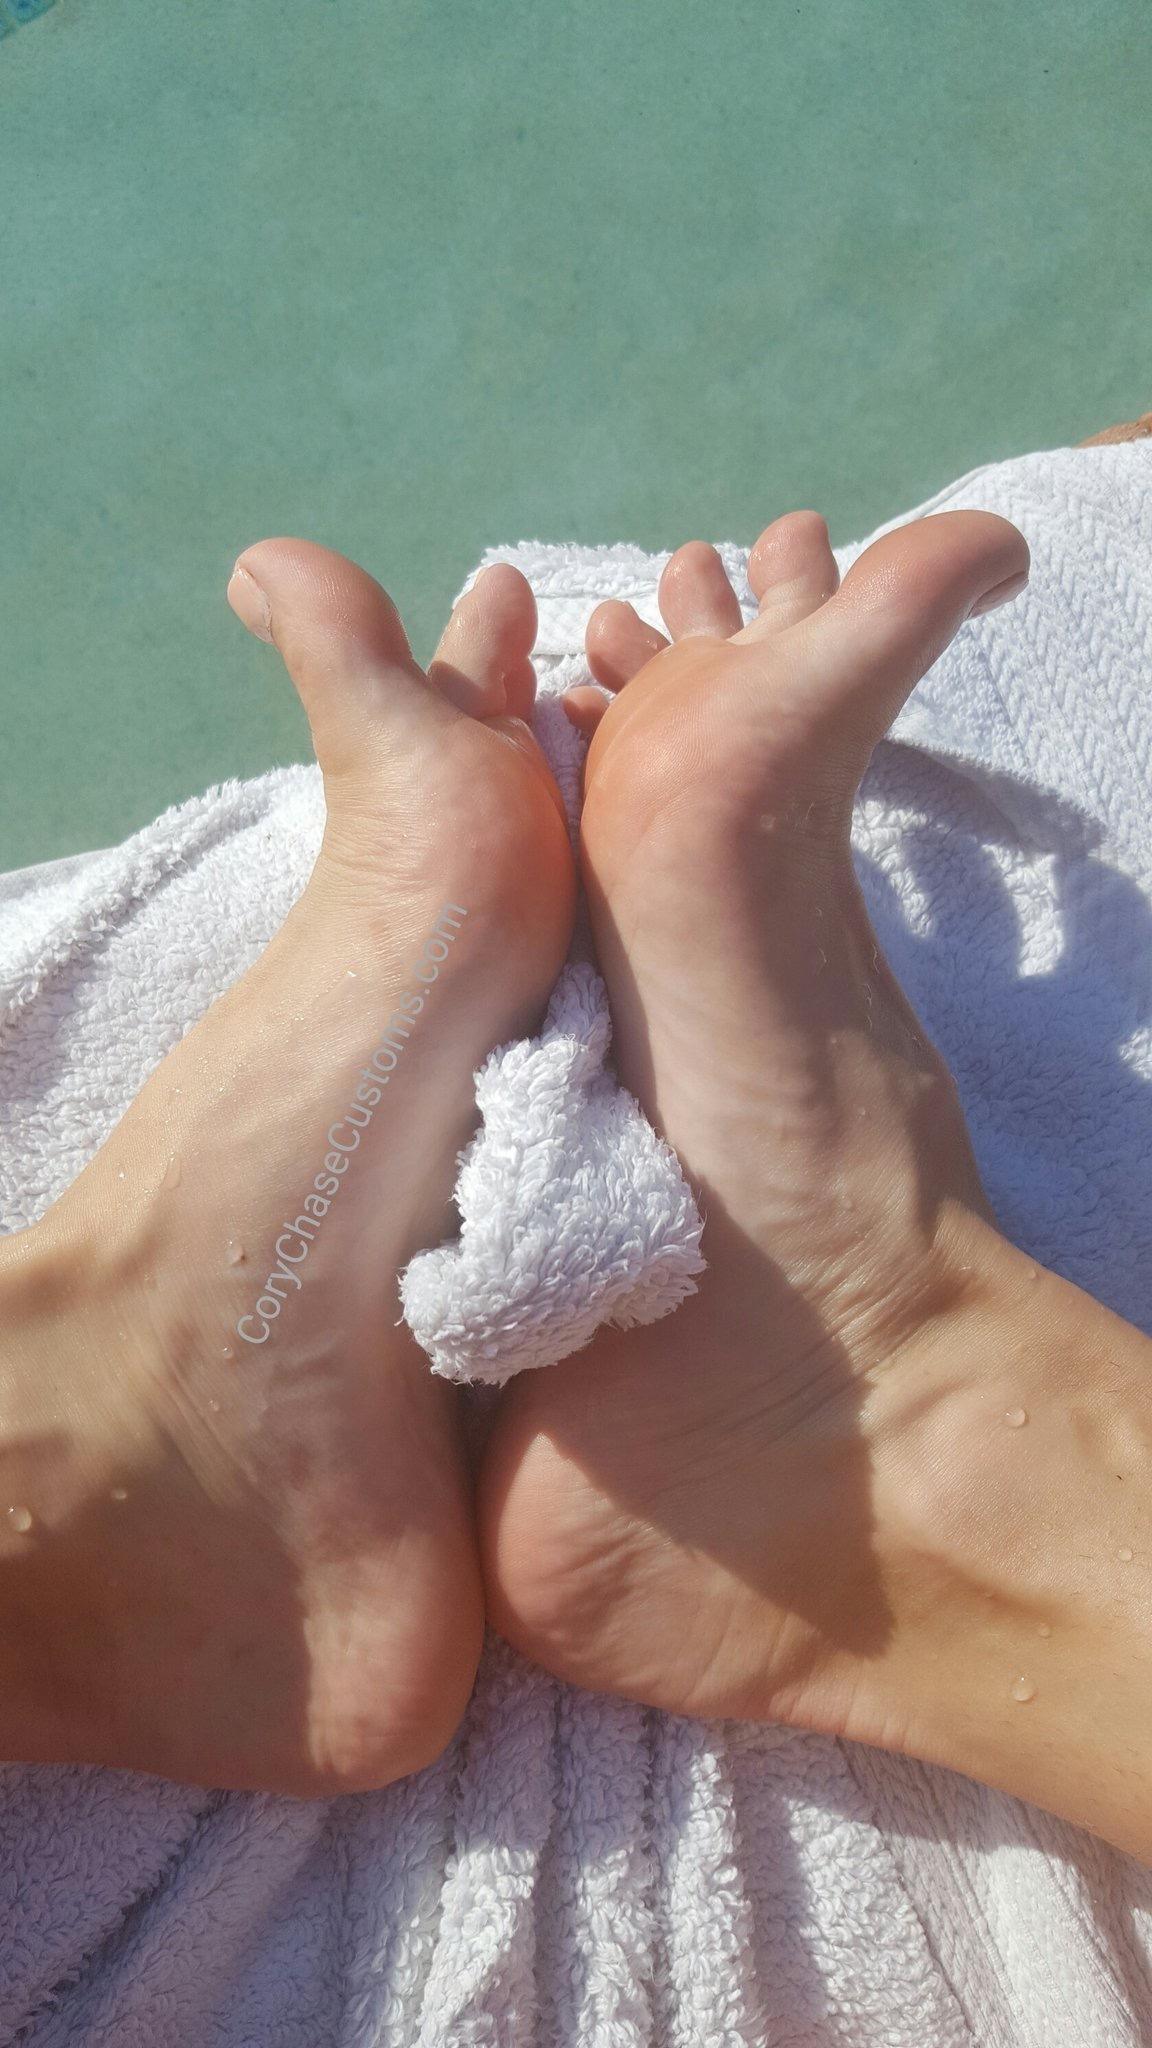 Cory Chase Feet